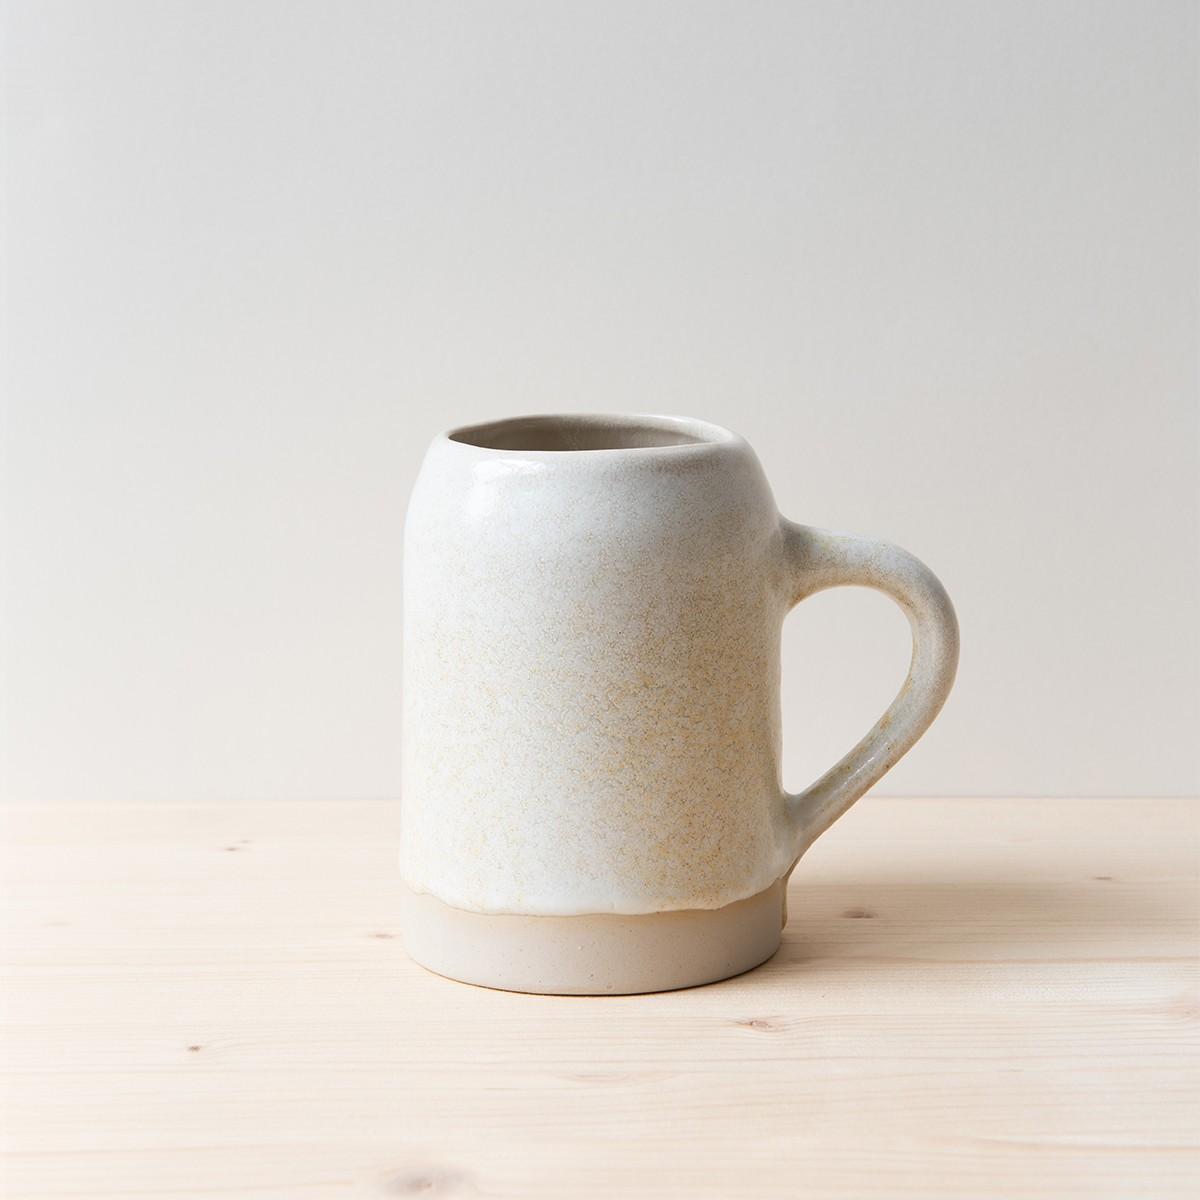 Studio Tonbo Mug Bierkrug 500ml Creme